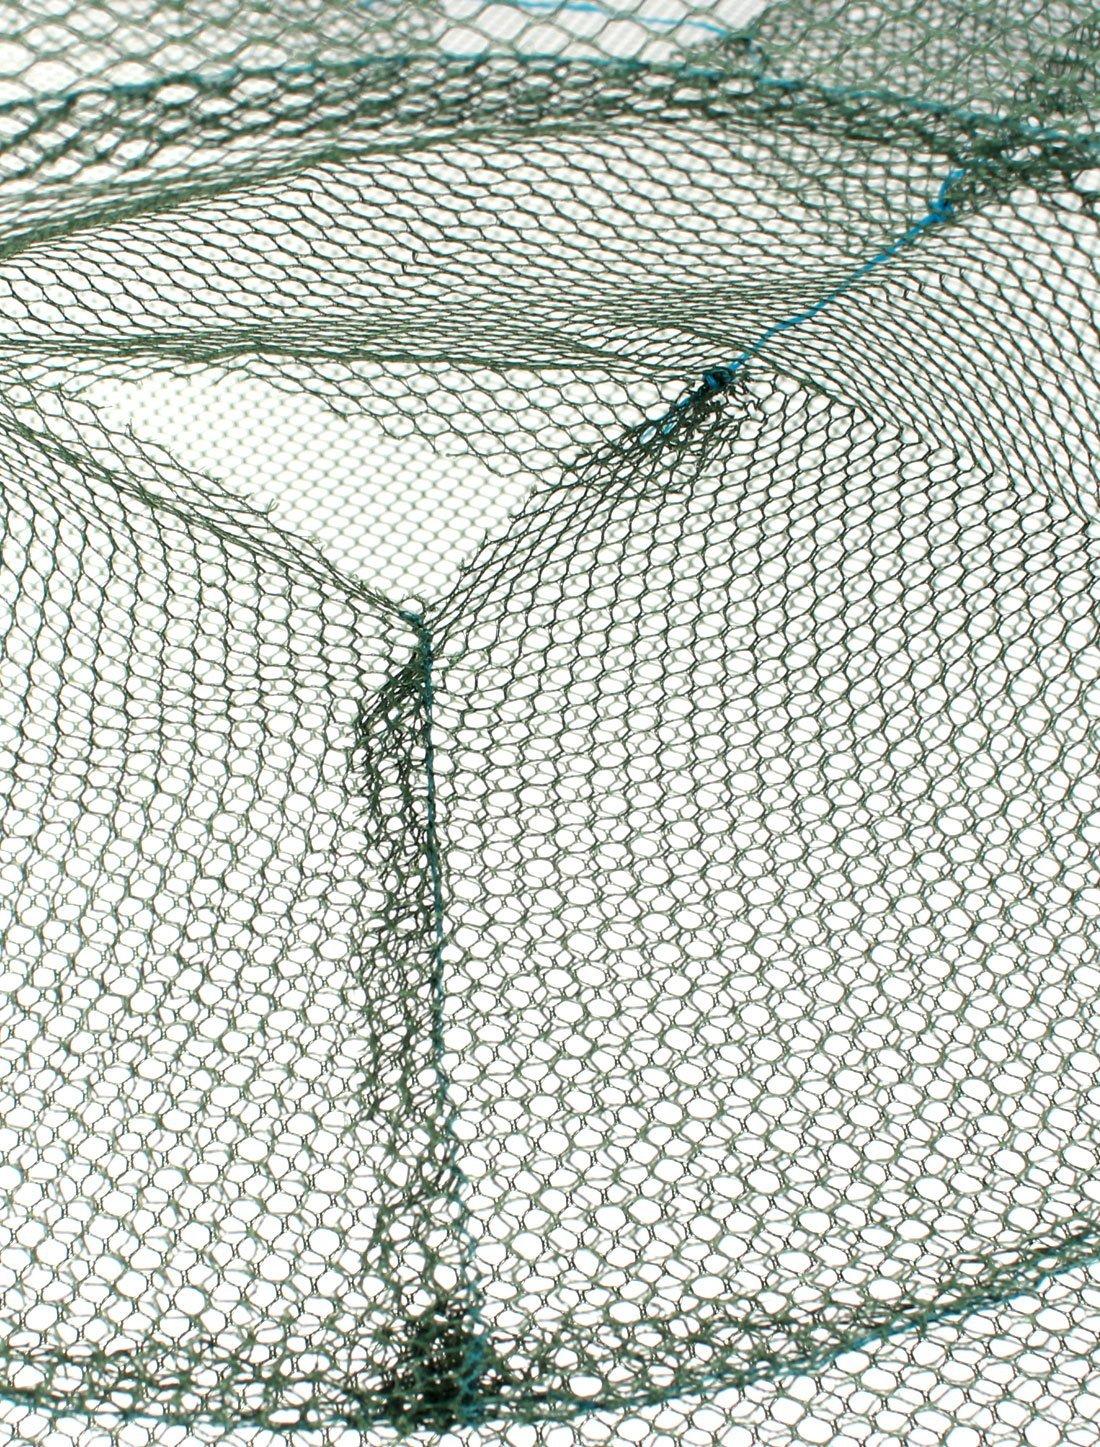 Amazon.com : eDealMax Paraguas de Nylon en Forma de Pesca del cangrejo Salabardo 60cm x 60cm Verde : Sports & Outdoors